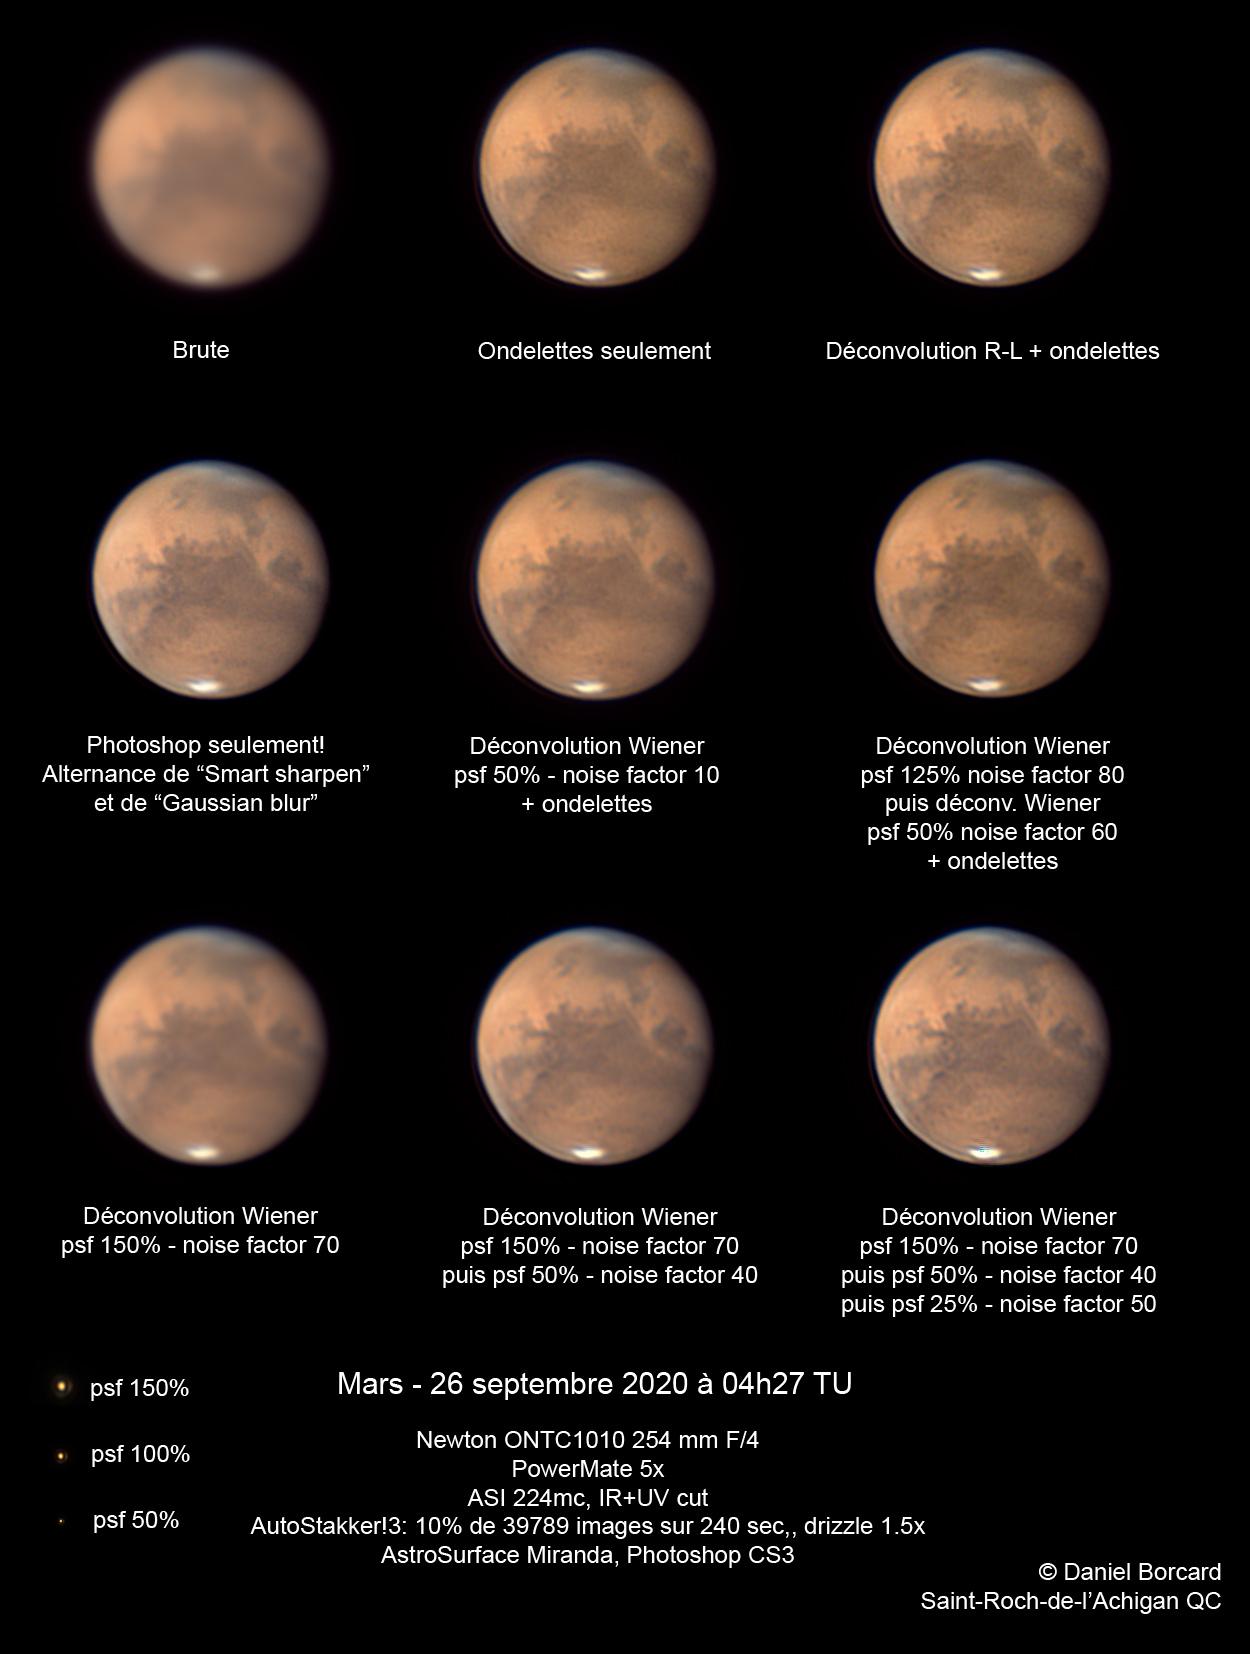 Mars_200926_0427_1_planche_compar.jpg.0afabd9cd22c967219b555e759f29069.jpg